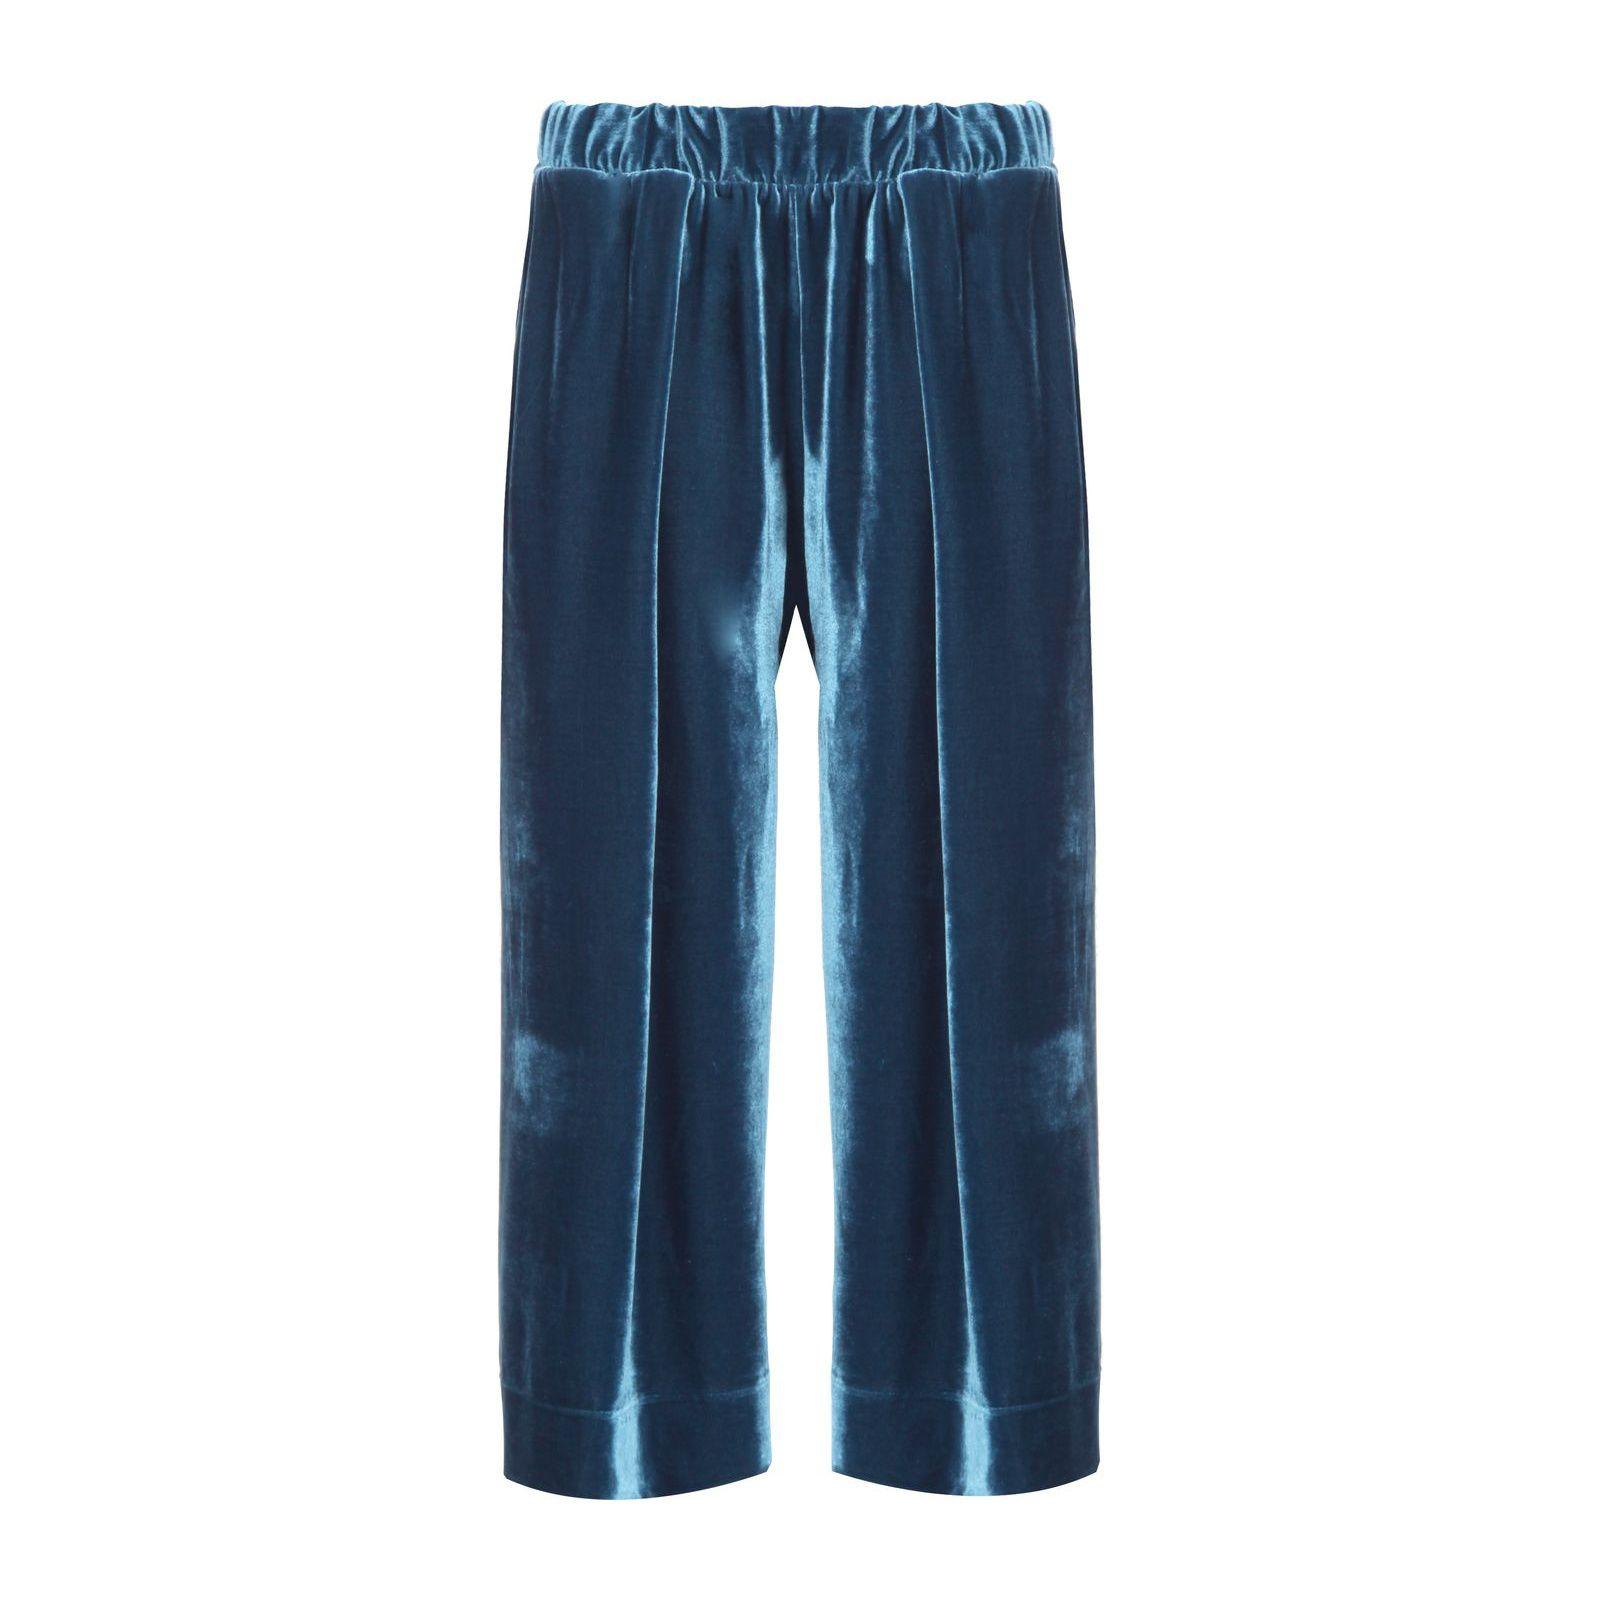 Calça Pantacourt Veludo Isabella Fiorentino - Azul